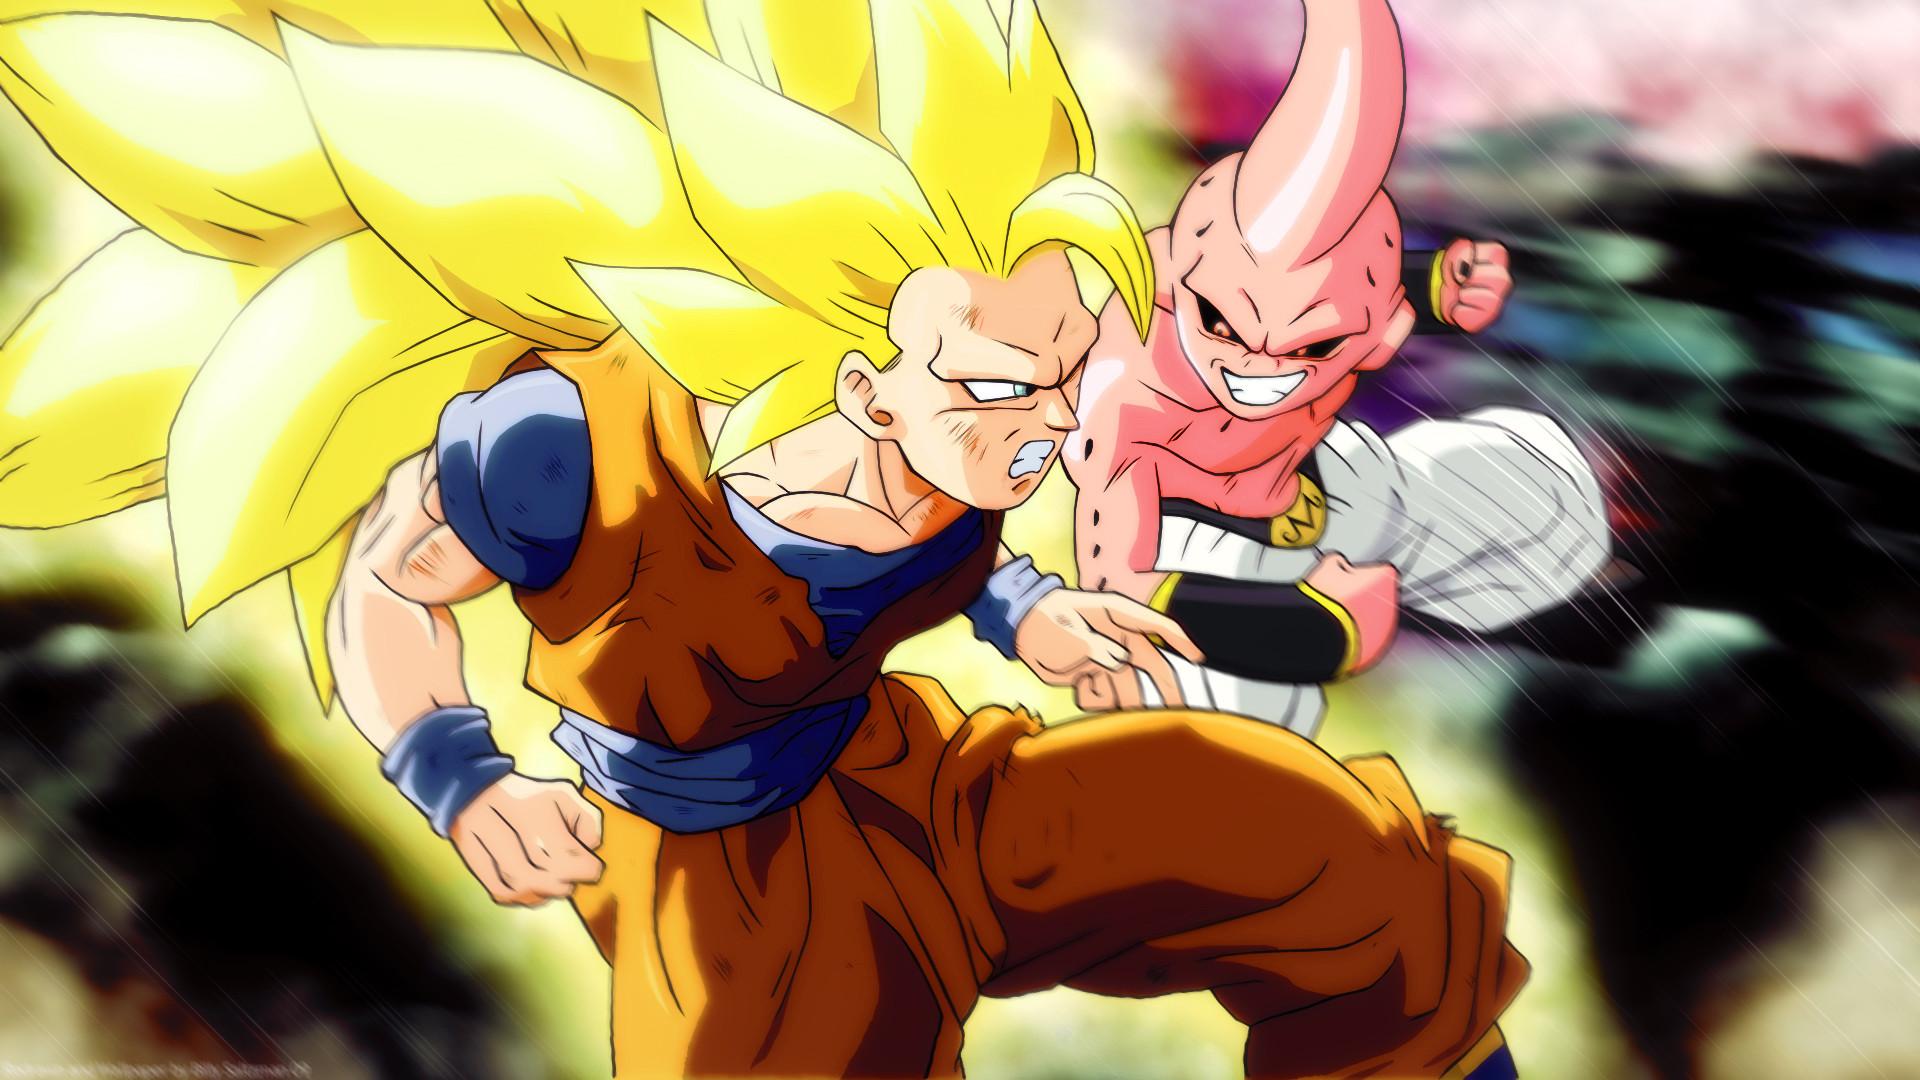 Goku Vs Broly Wallpaper 61 Images